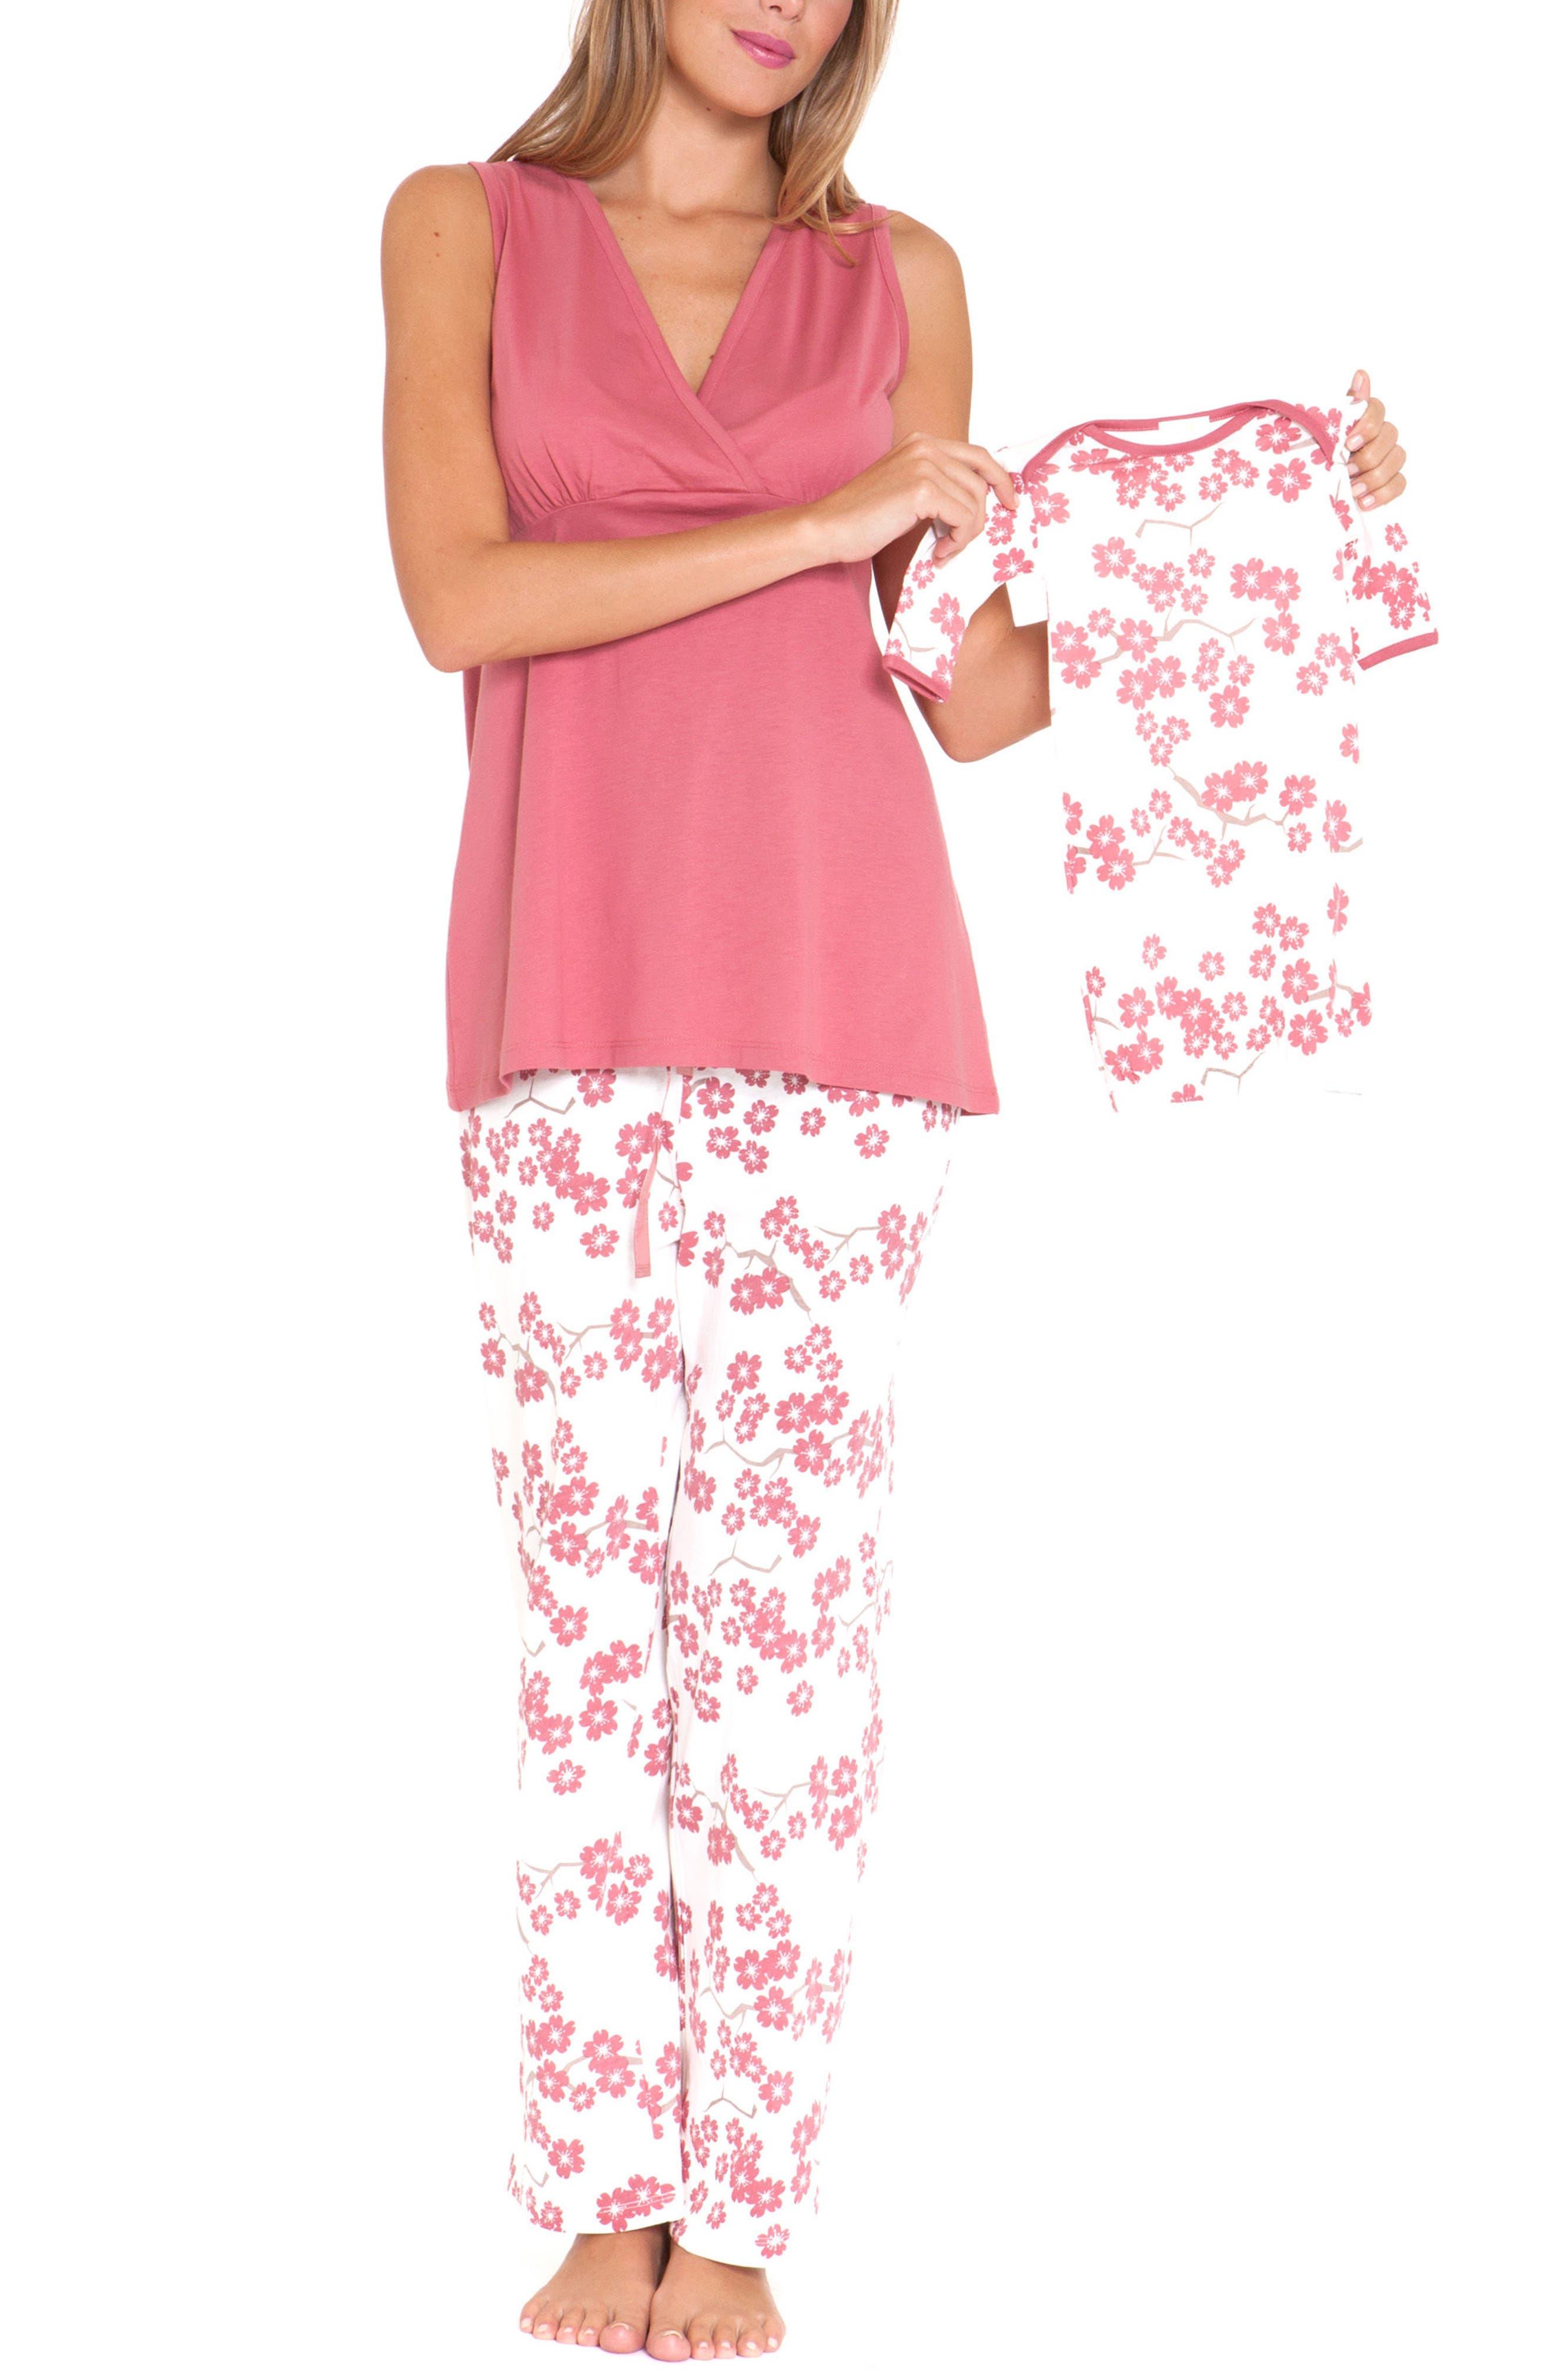 Alternate Image 1 Selected - Olian 4-Piece Maternity Sleepwear Gift Set